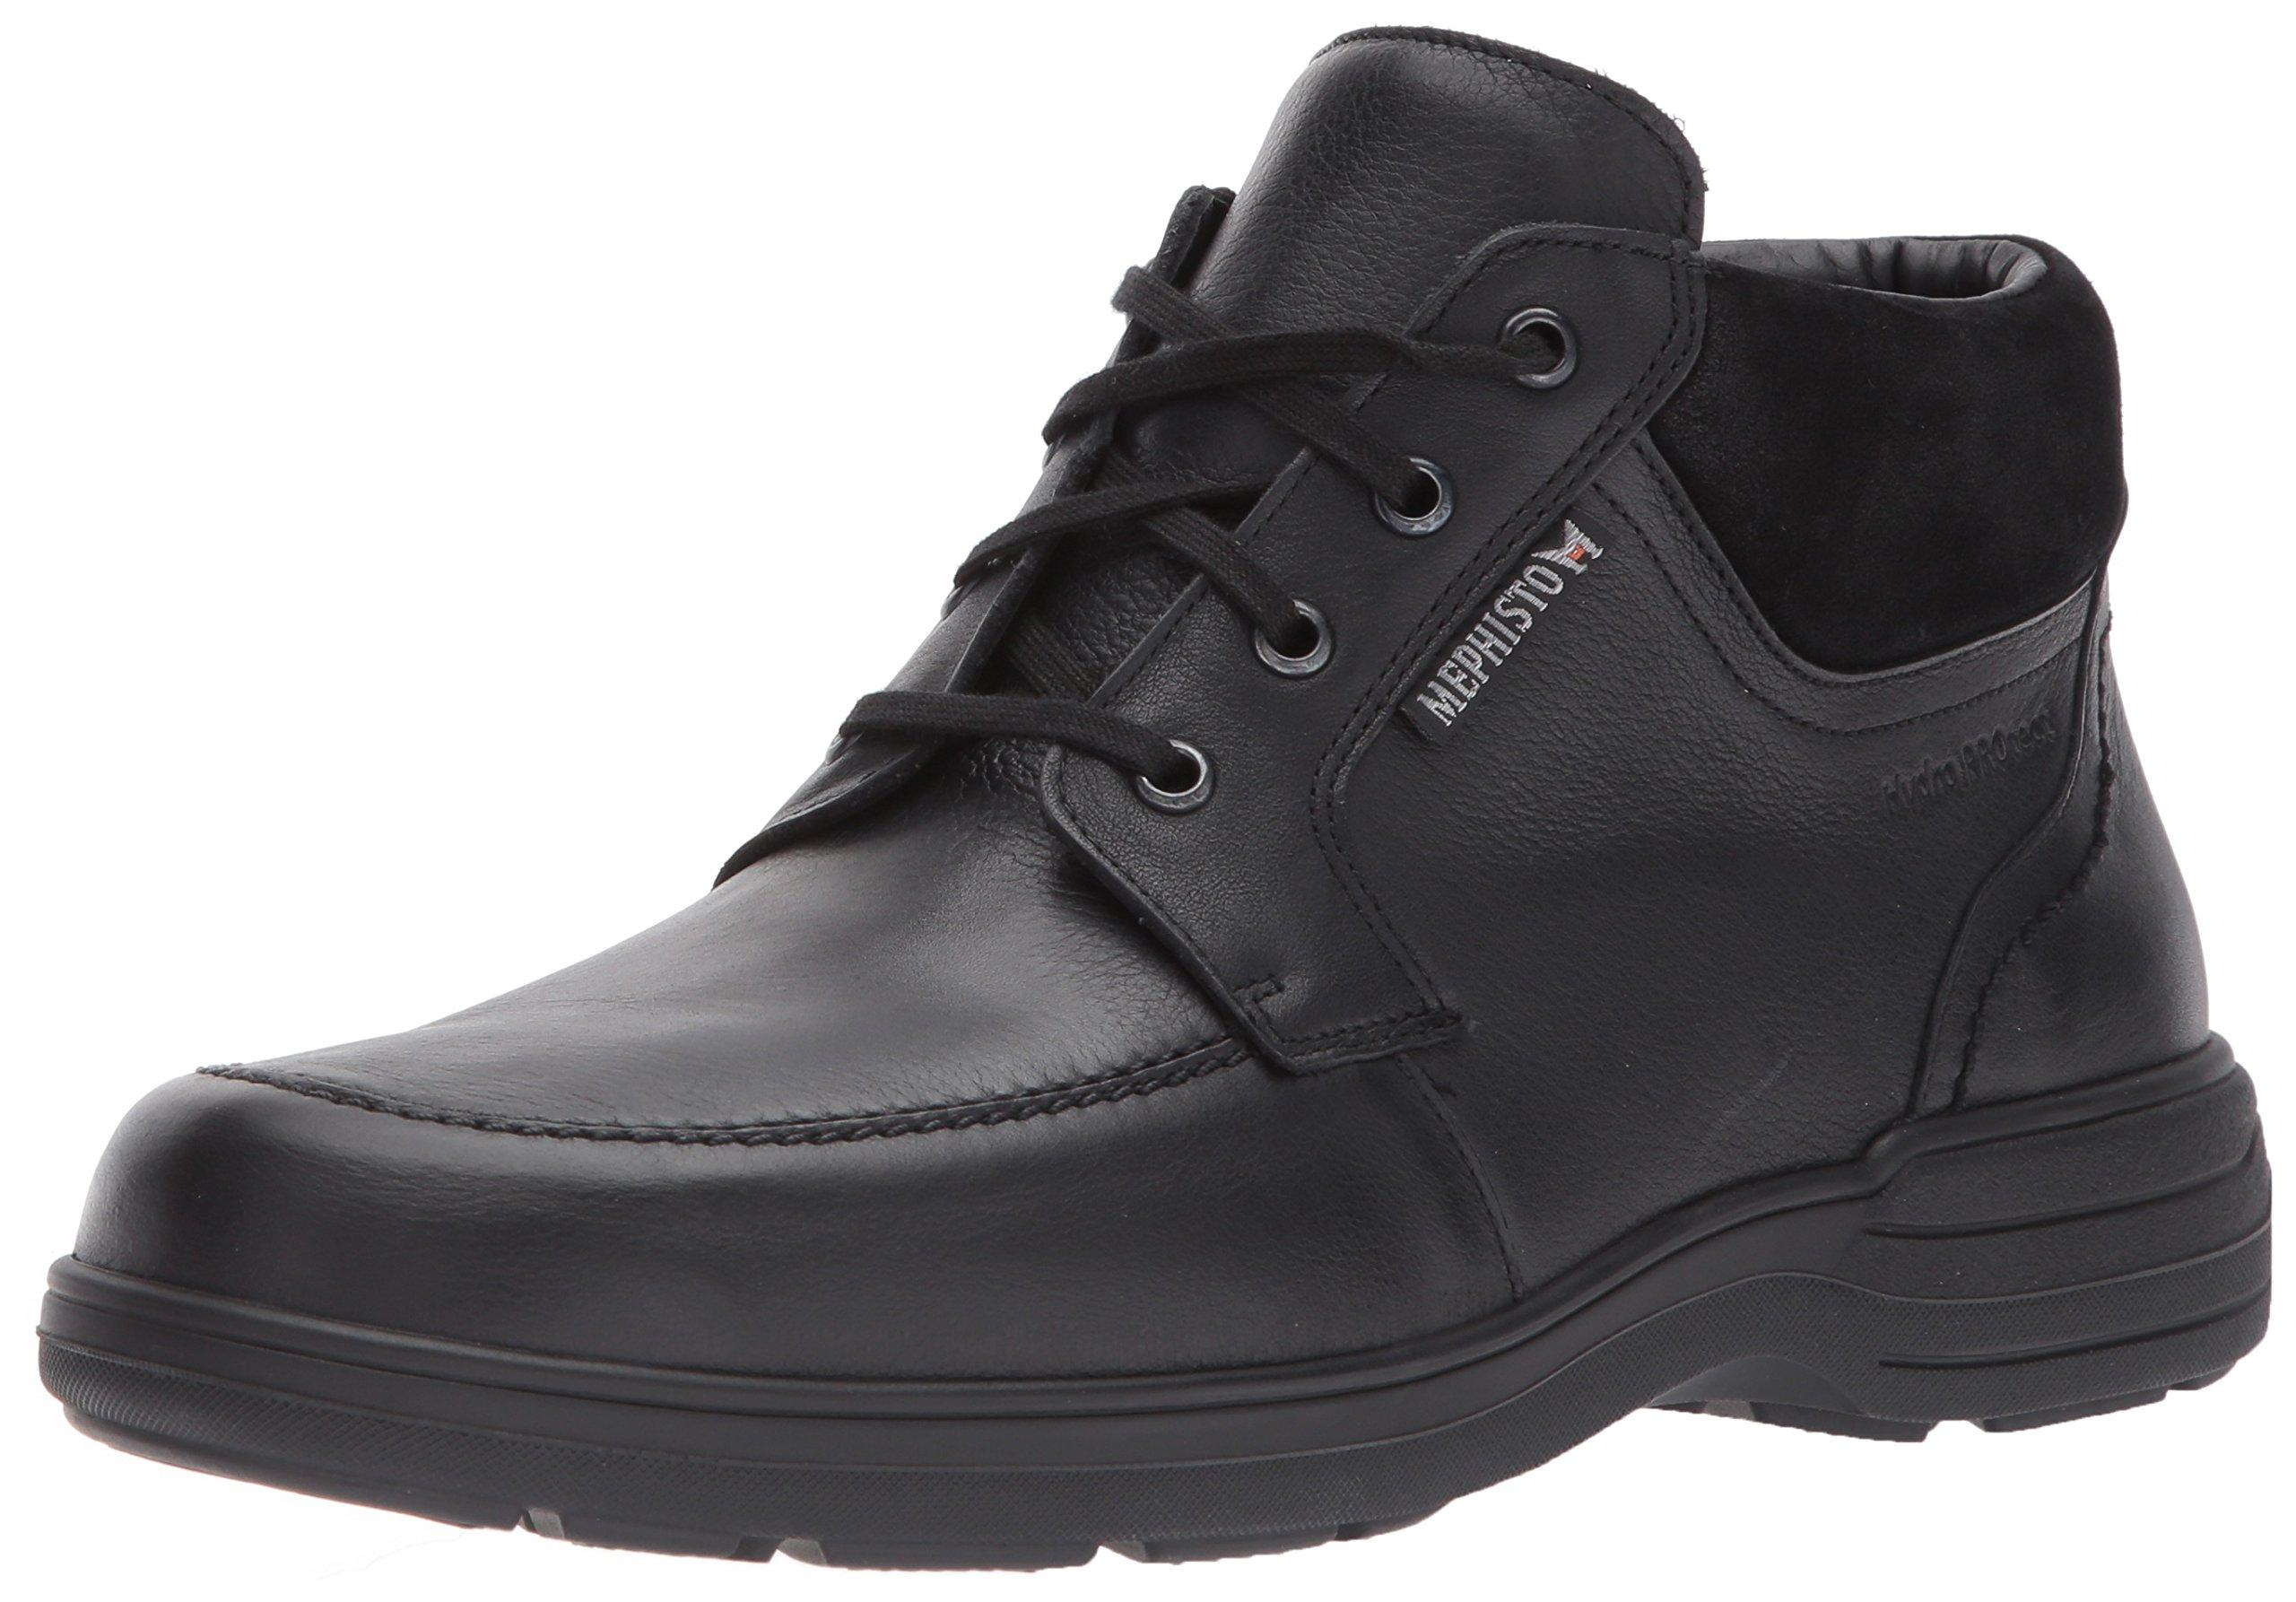 Mephisto Men's Darwin Rain Boot, Black Riko/Suede, 10.5 M US